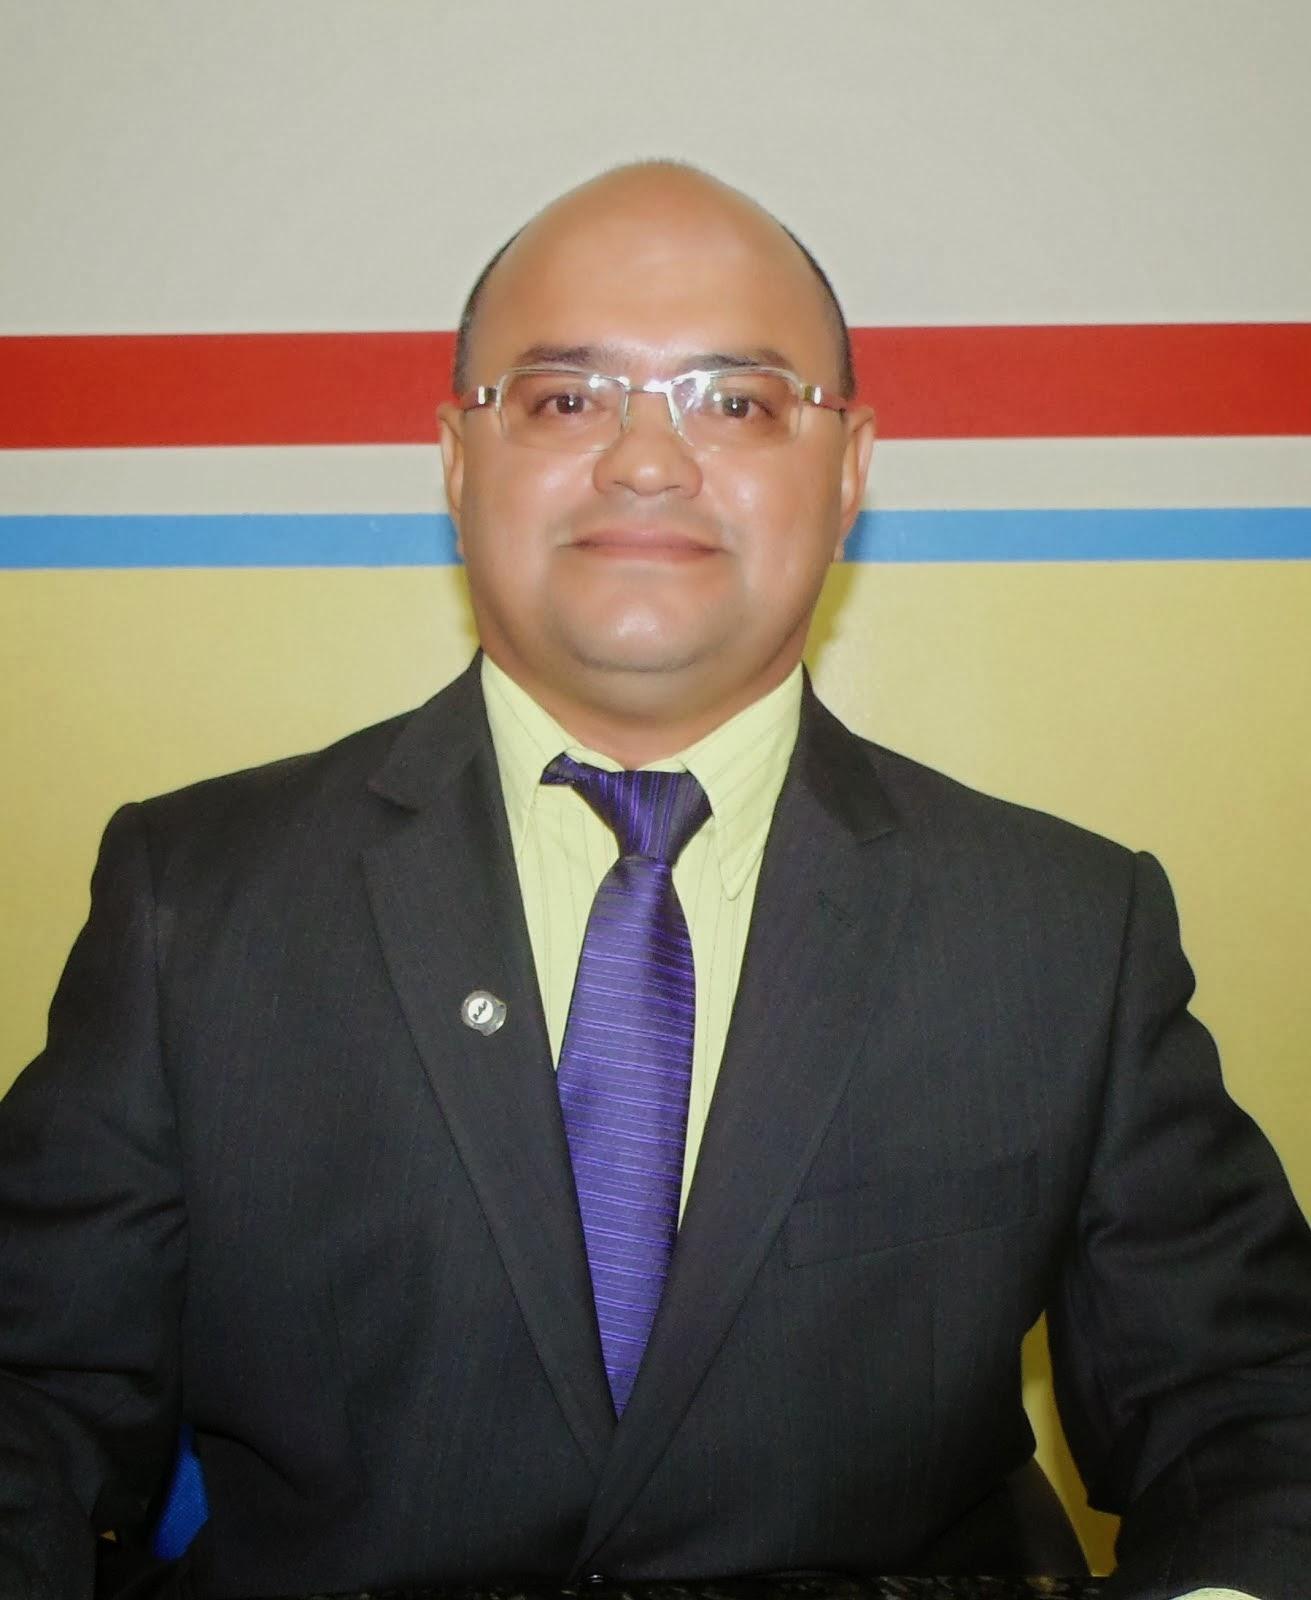 VEREADOR JÚNIOR DE MOCINHA (PRESIDENTE DA CÂMARA)